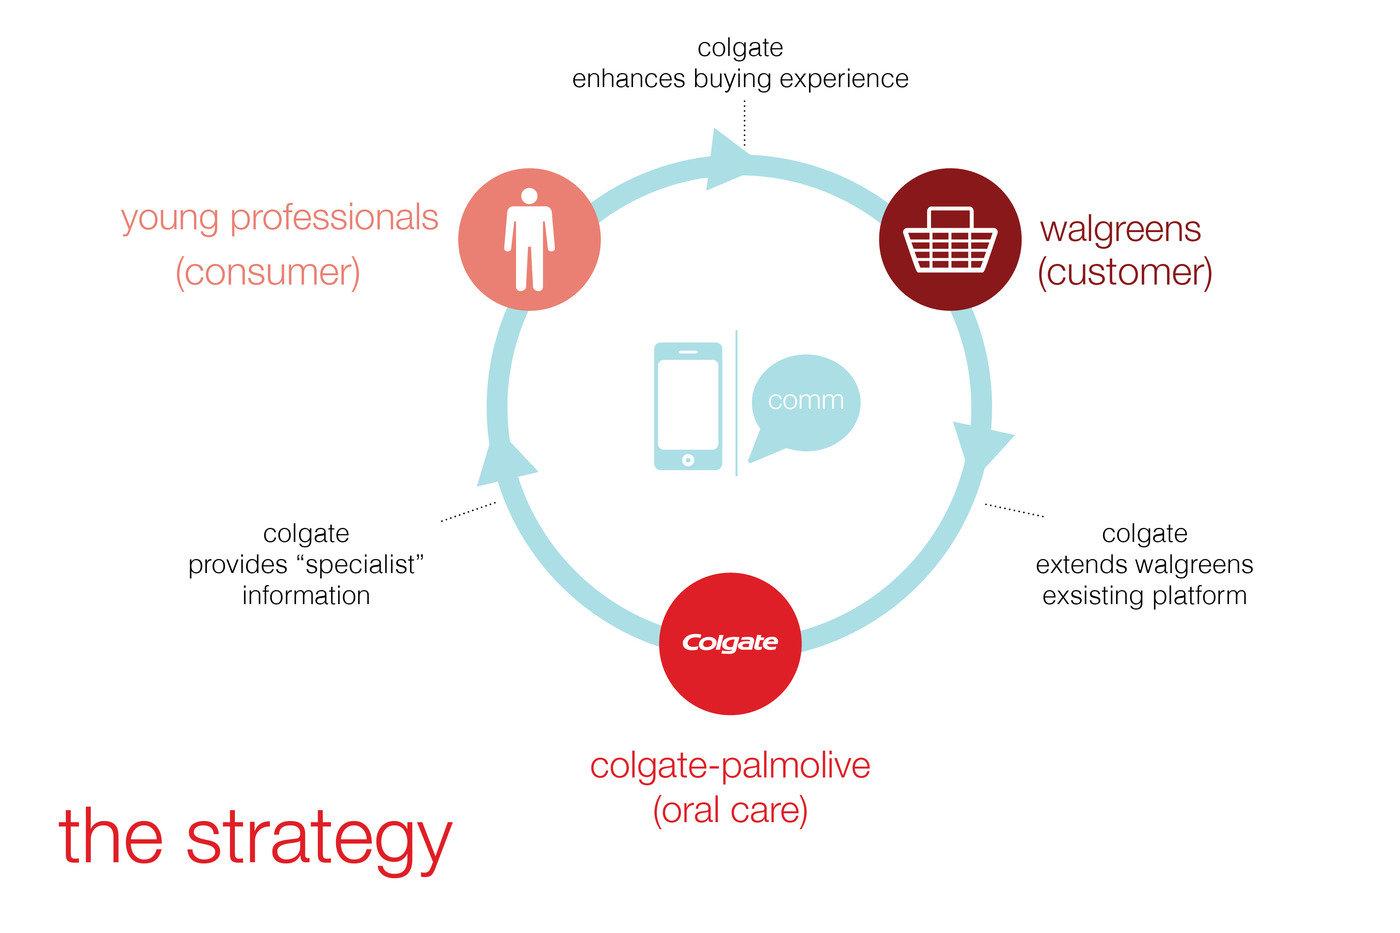 colgate palmolive business strategy